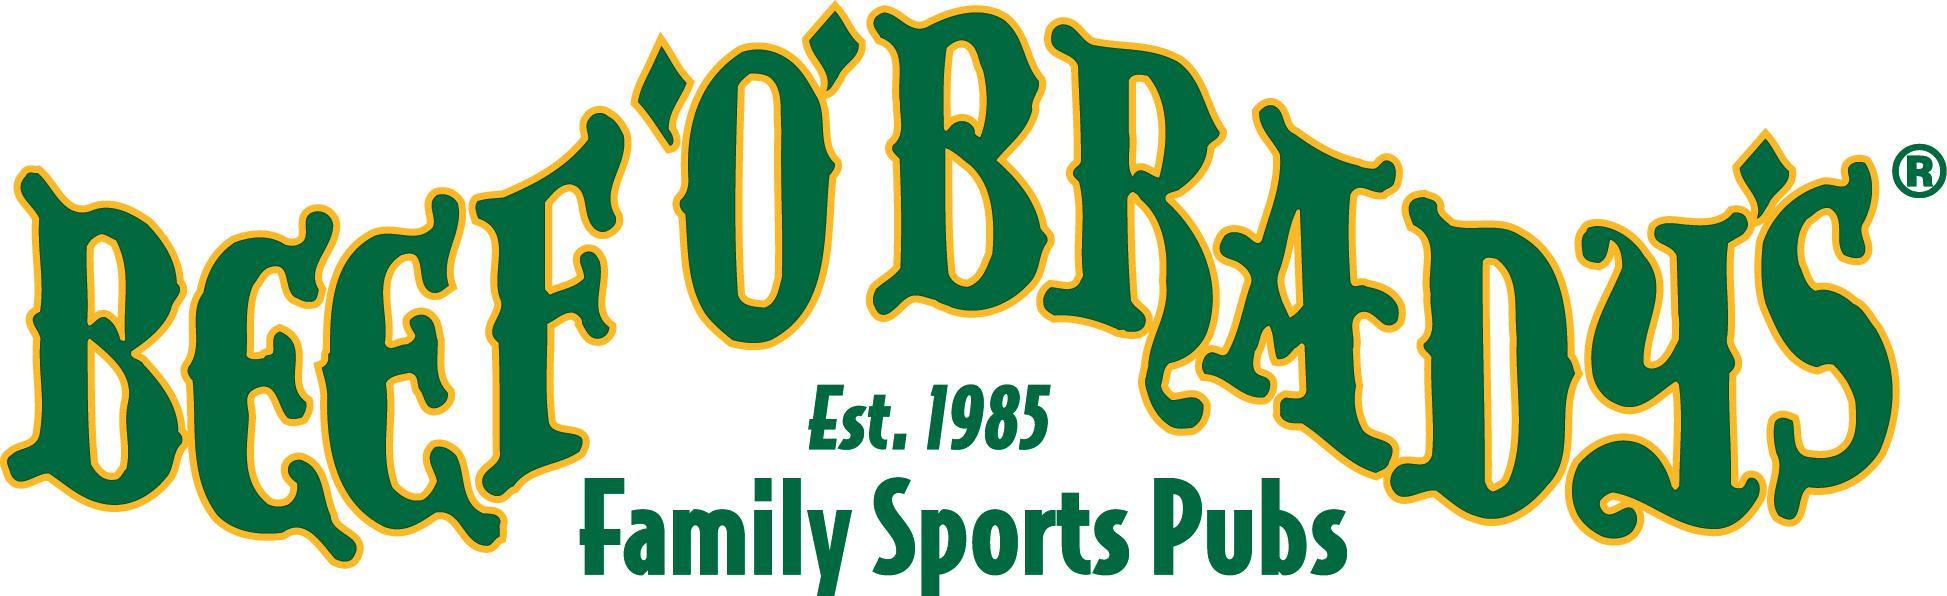 Beef O'Brady's Family Sports Pubs